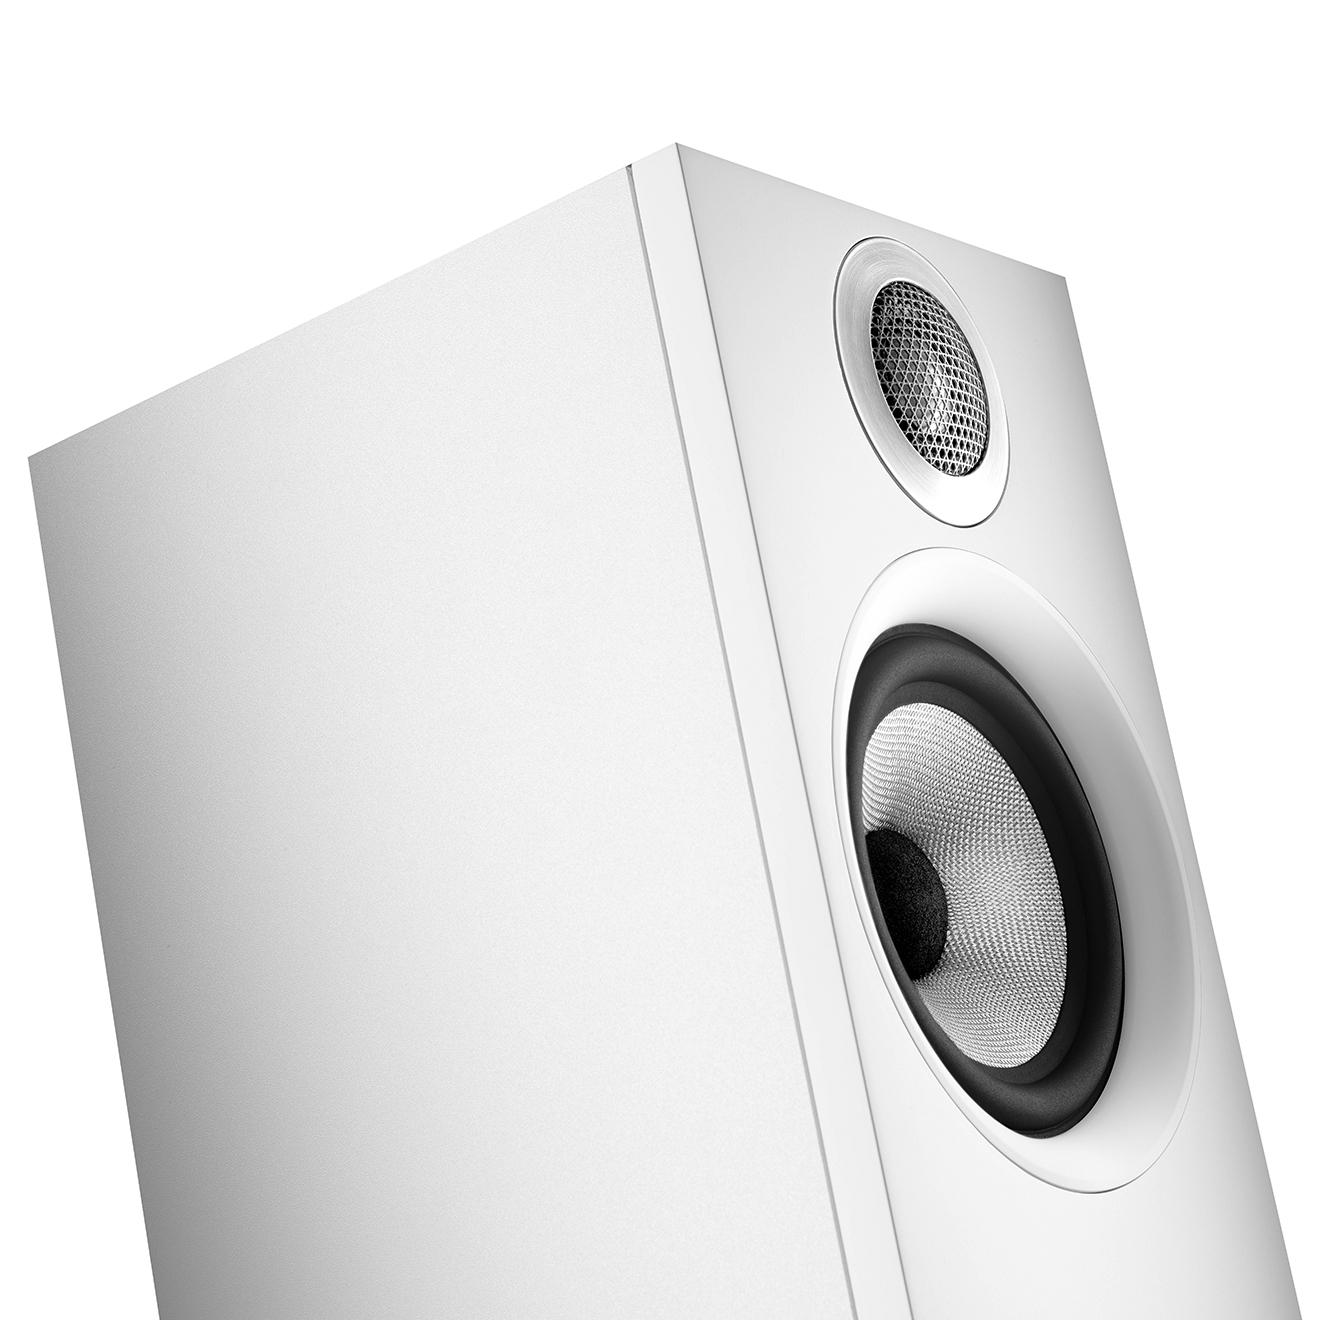 Bowers & Wilkins 607 Standmount speaker - £299.25 at Bowers & Wilkins Shop